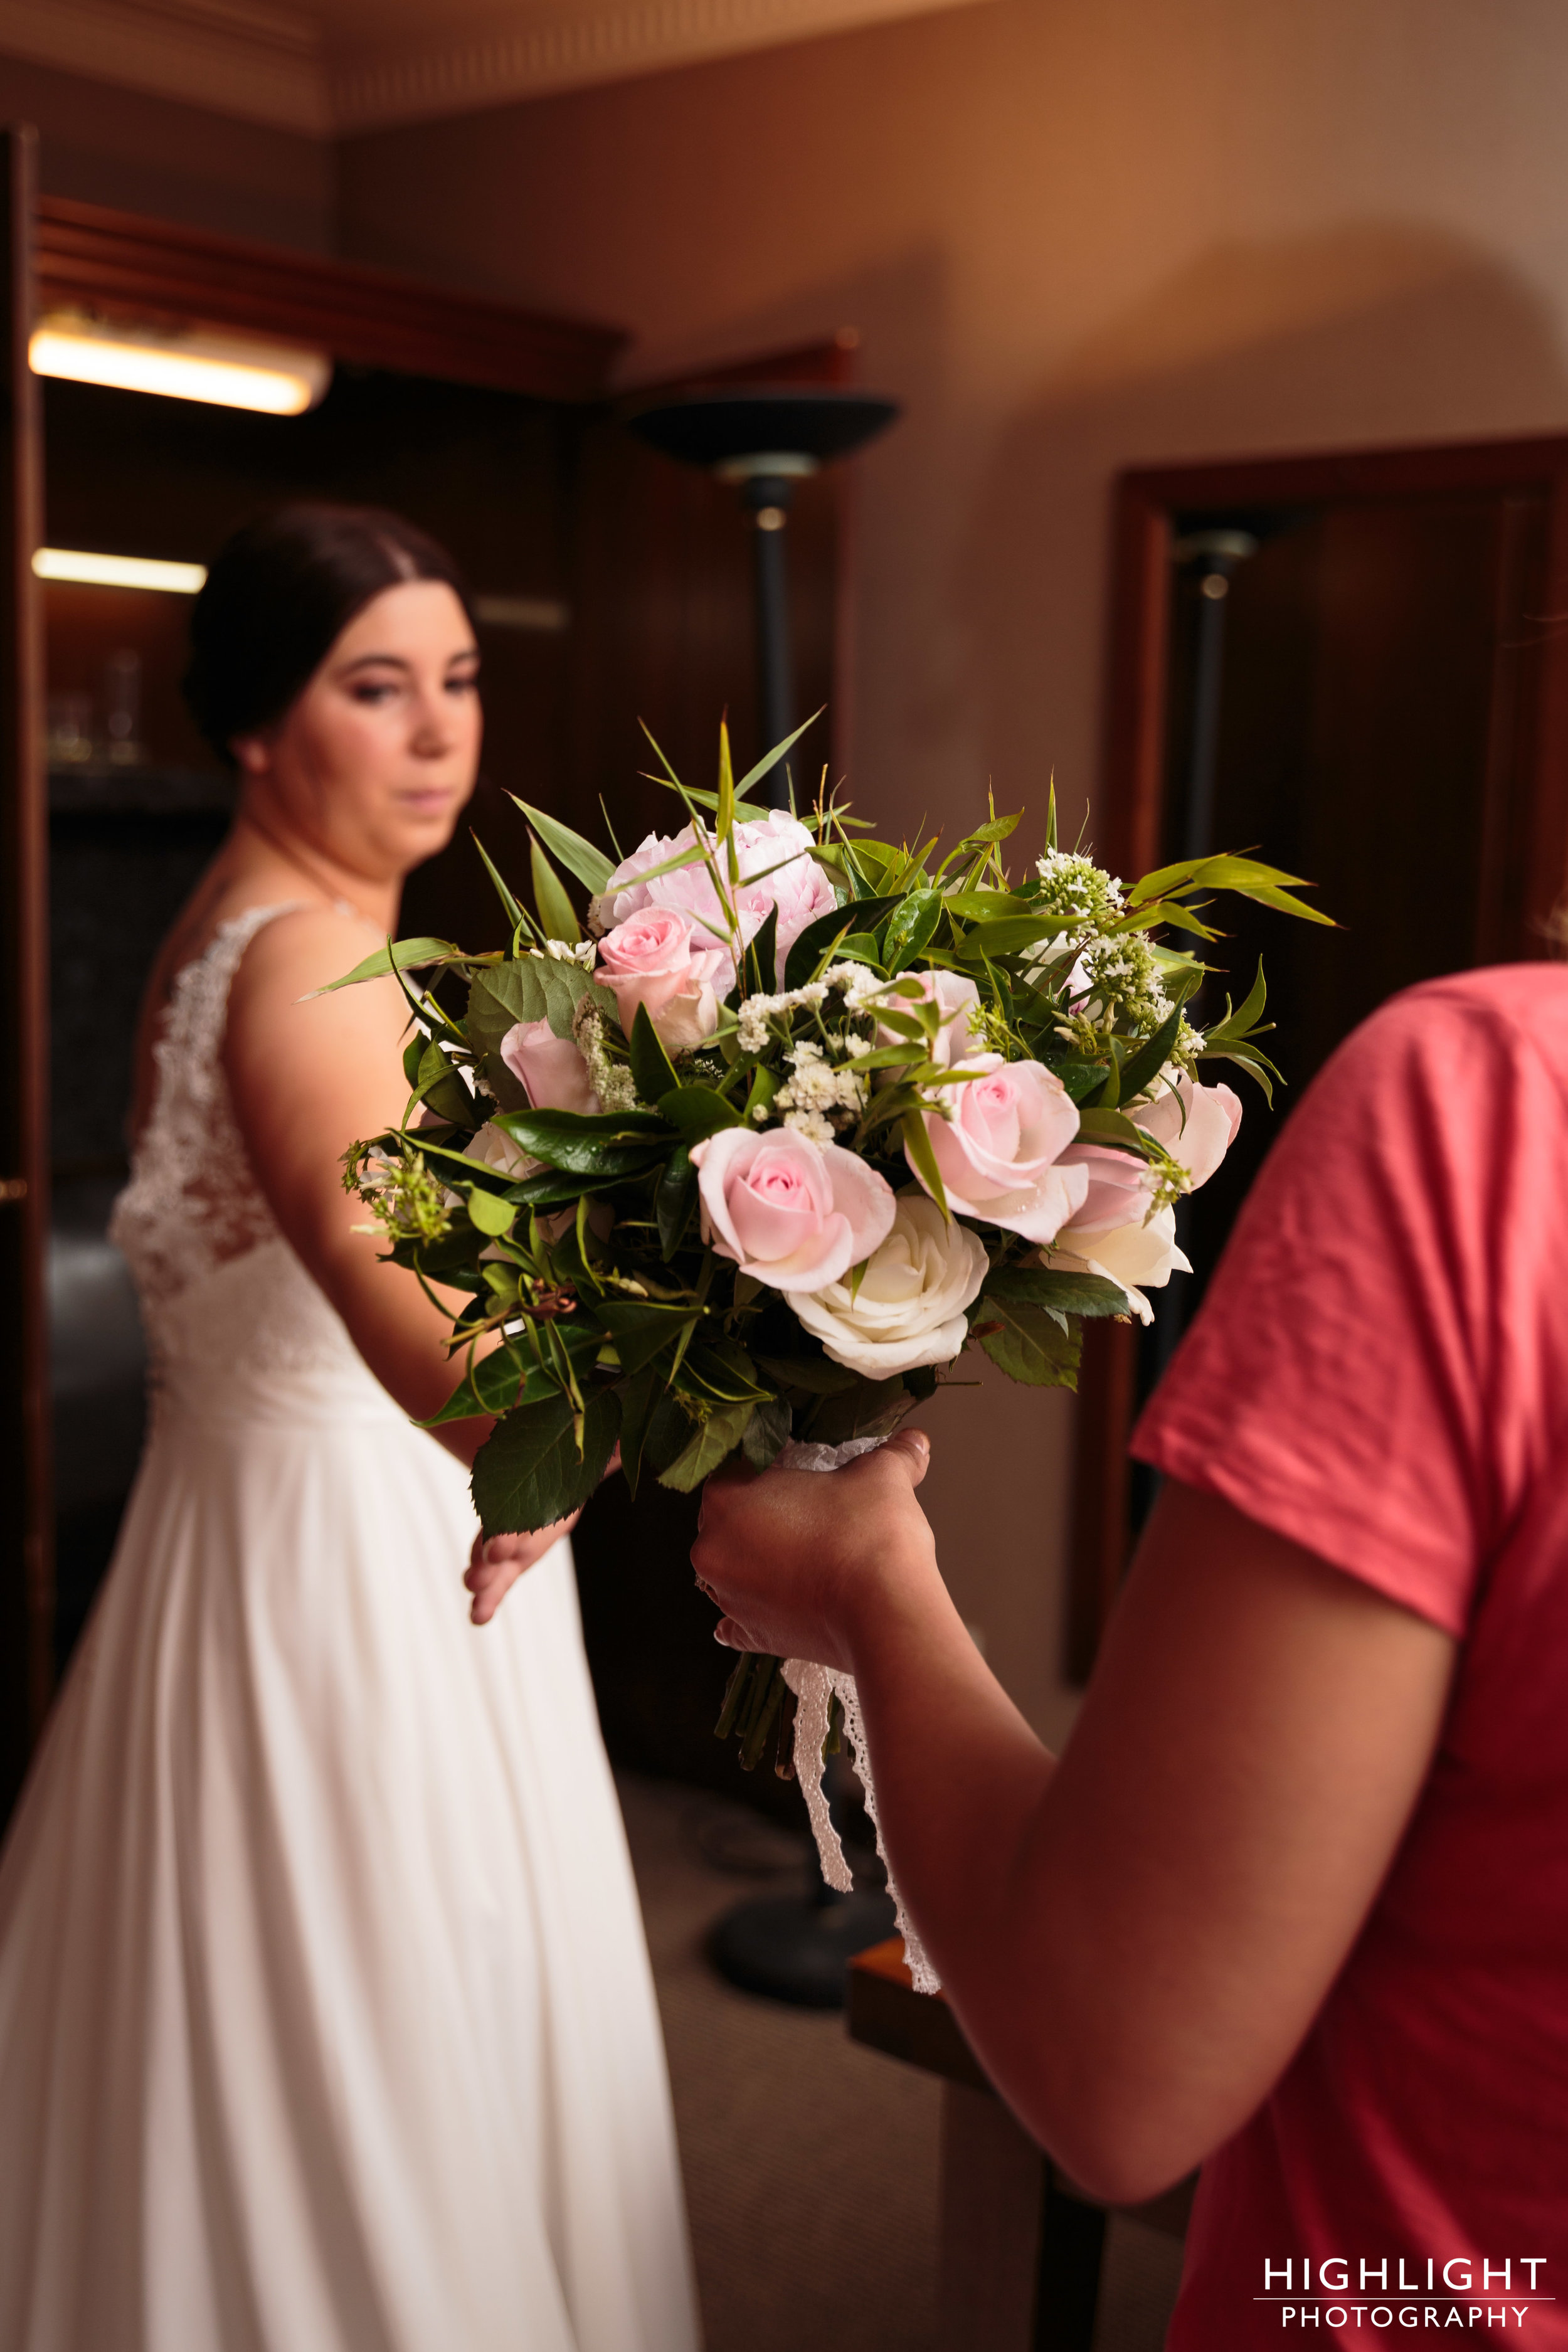 JM-2017-Highlight-wedding-photography-palmerston-north-new-zealand-21.jpg